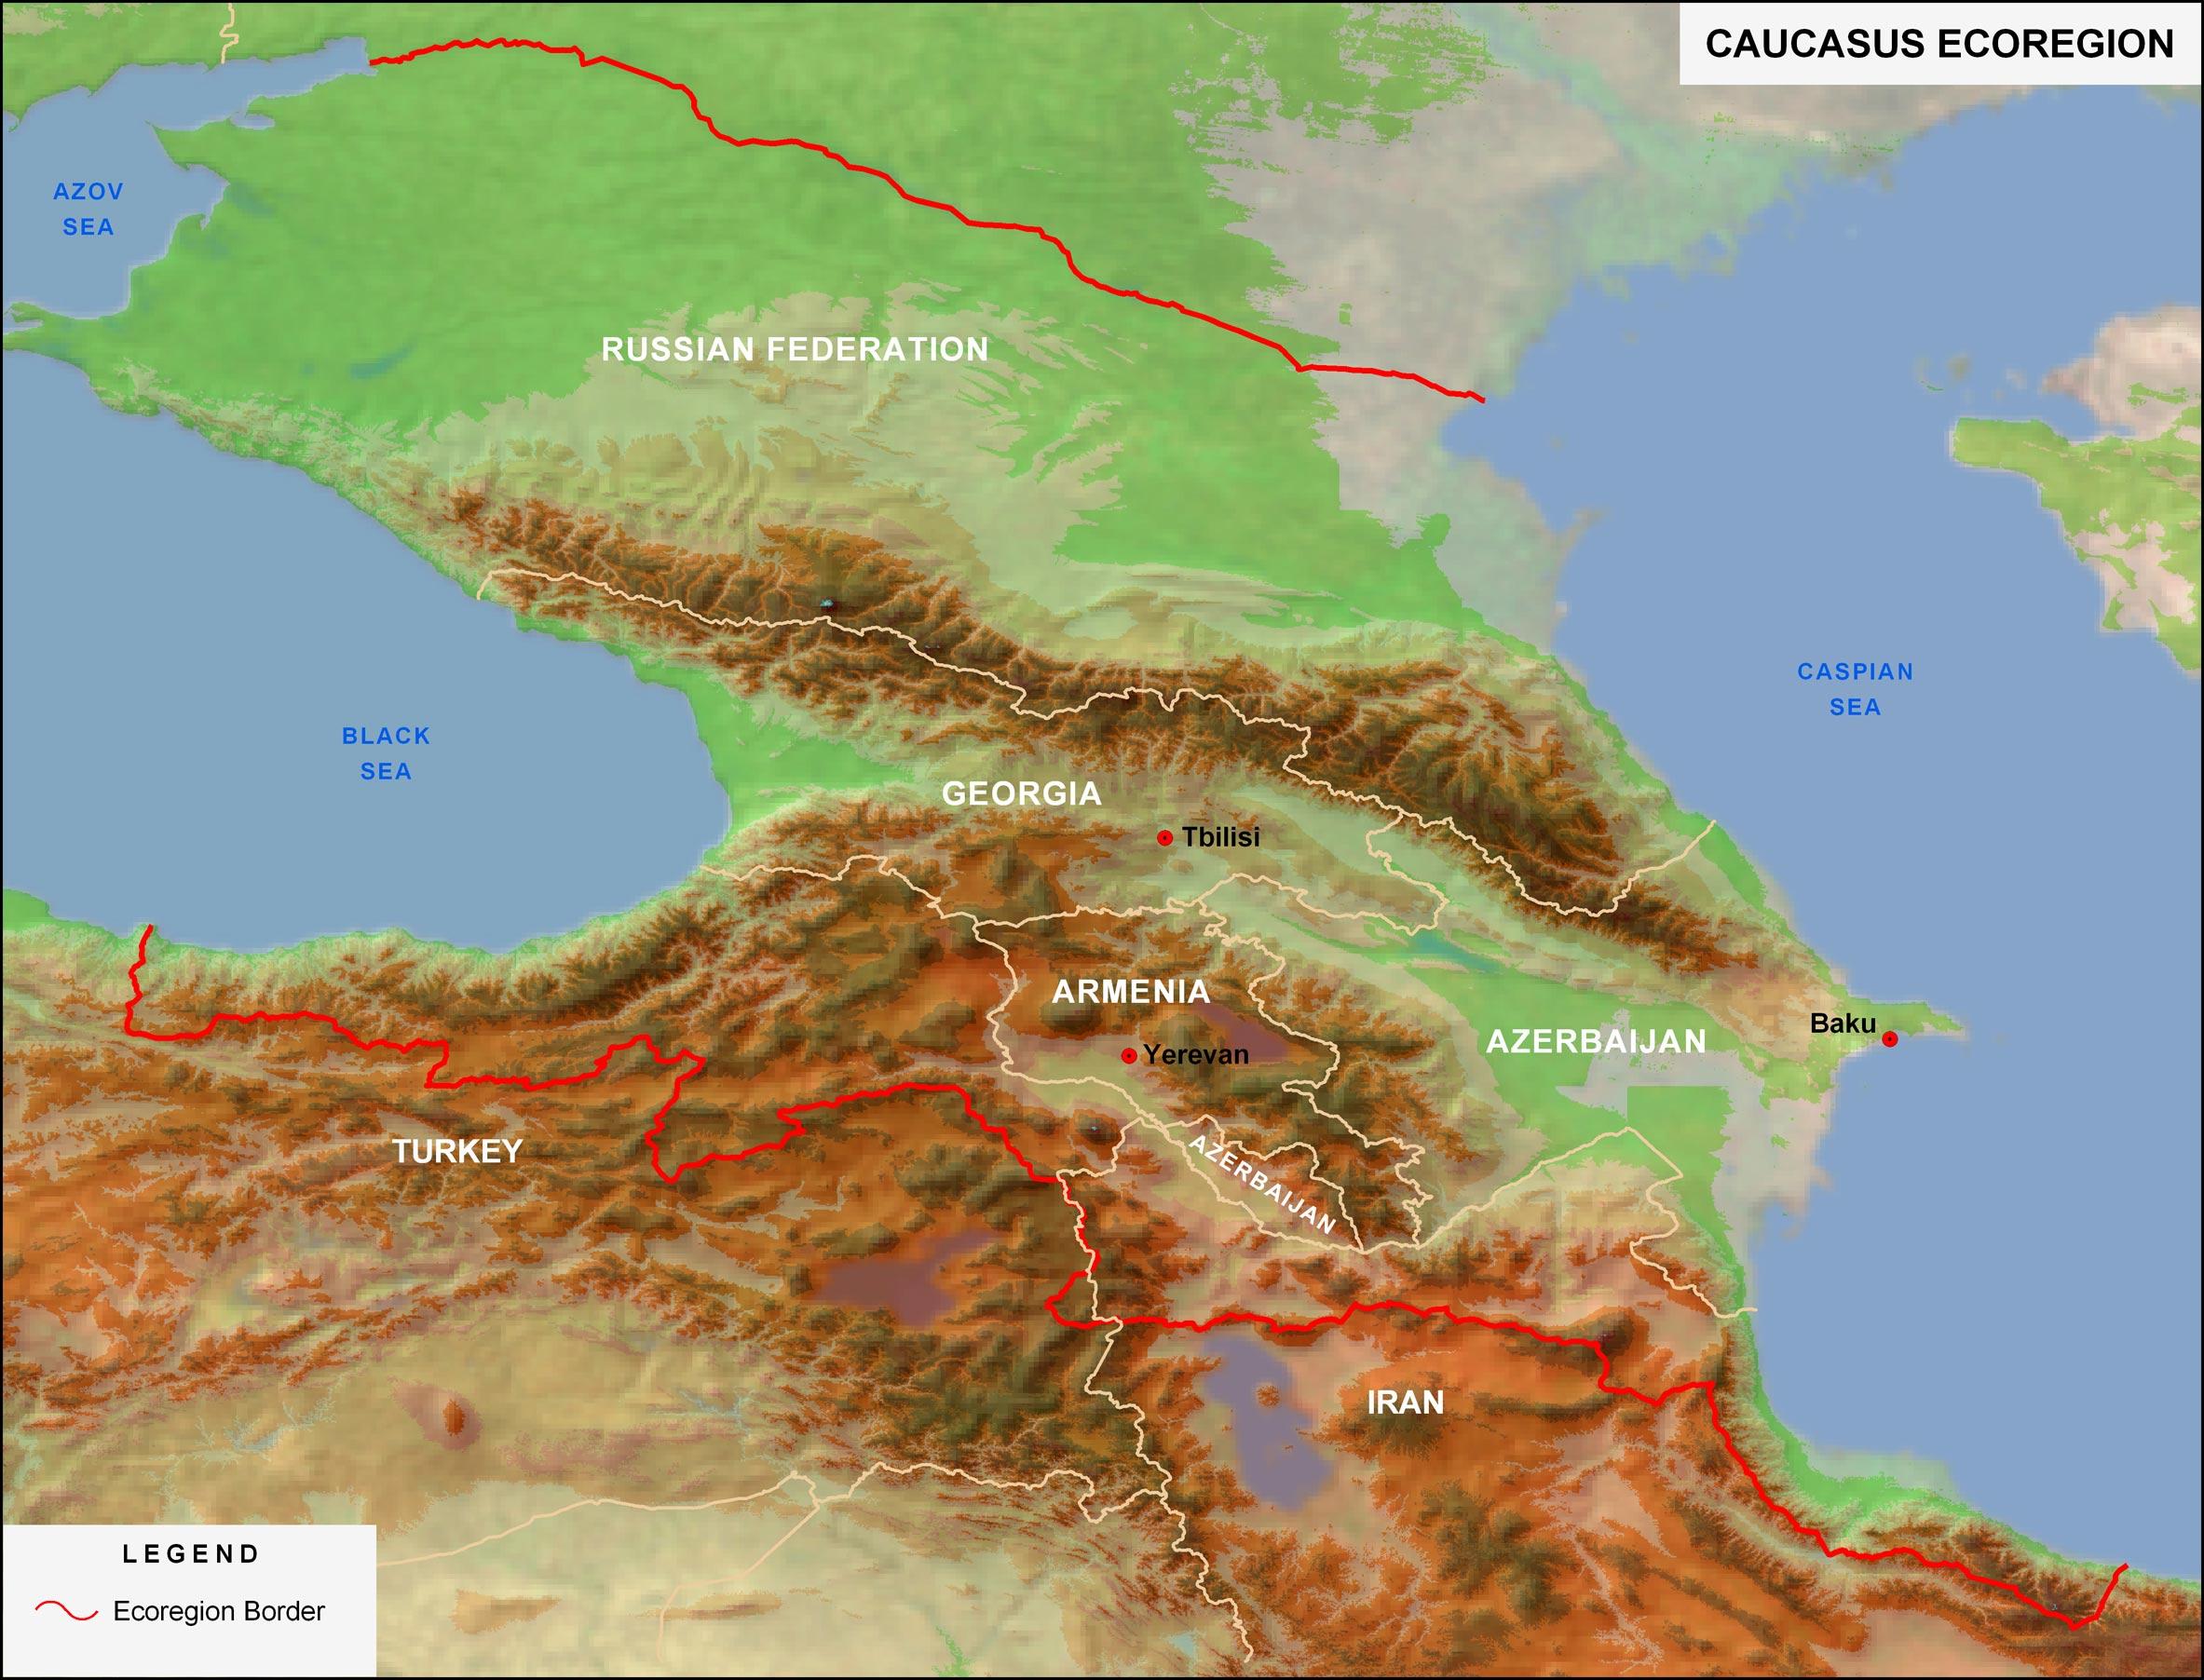 High Resolution Wallpaper | Caucasus 2366x1804 px